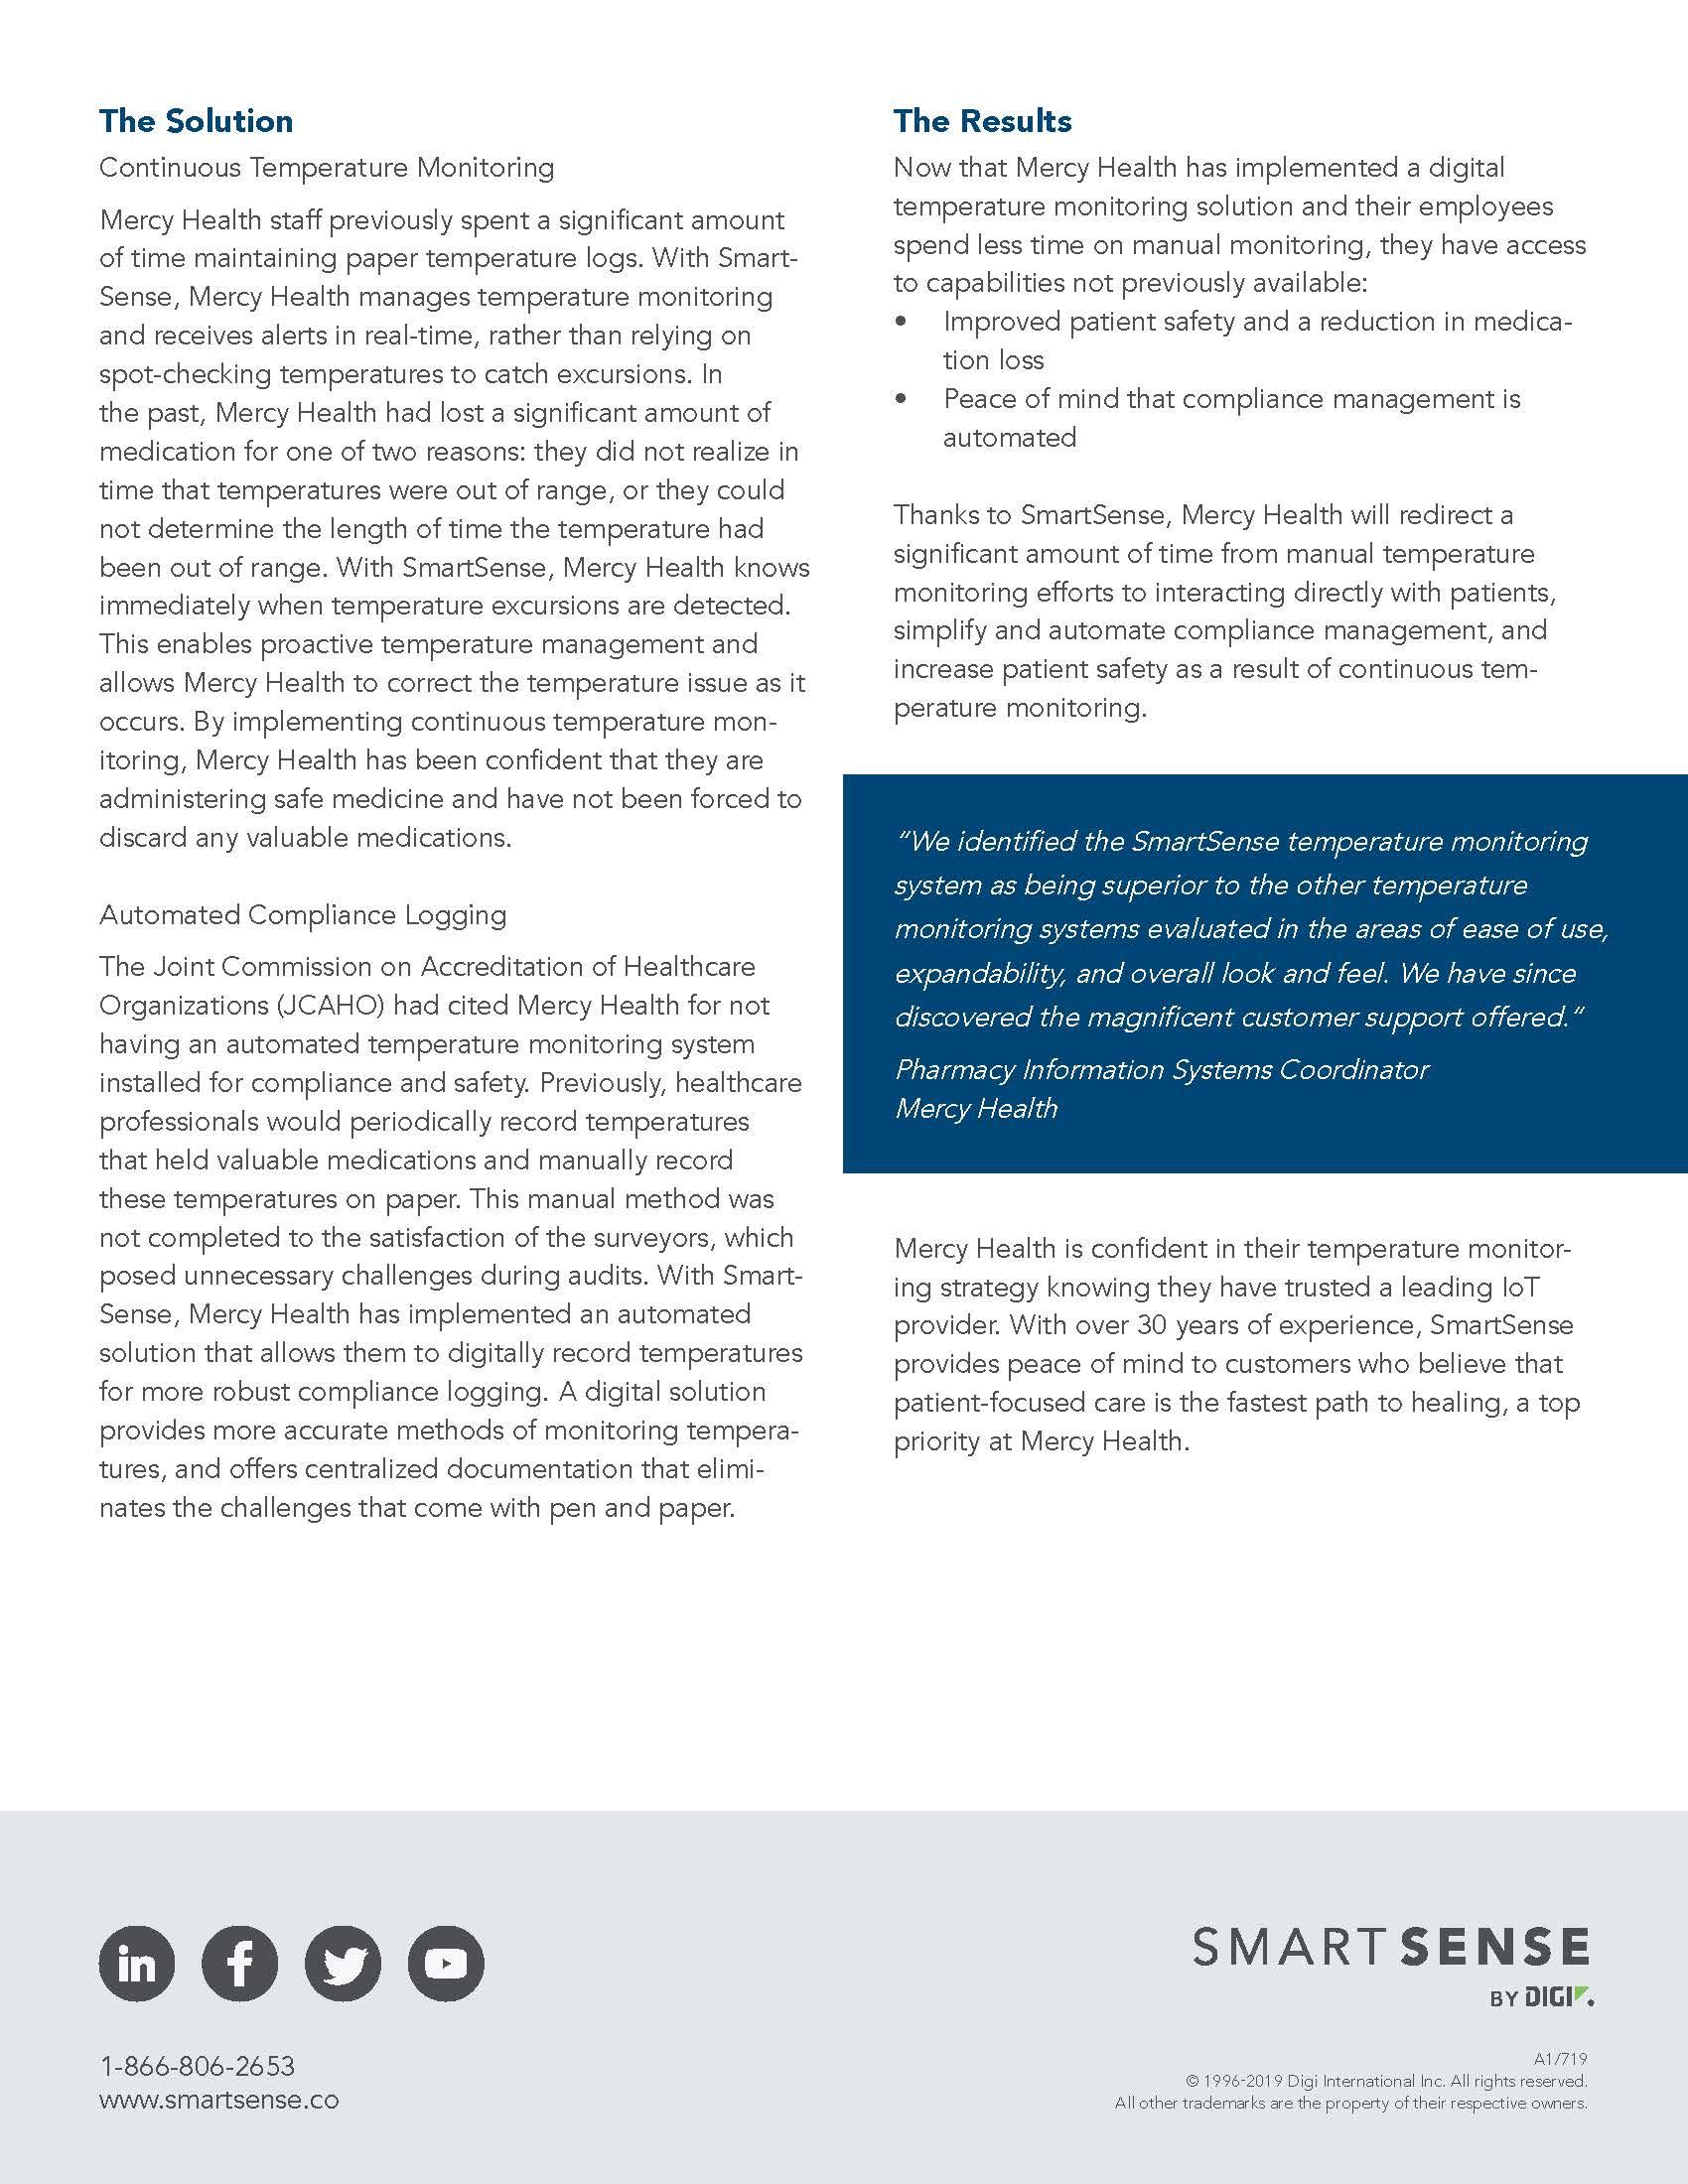 mercy_health_case_study_Page_2.jpg